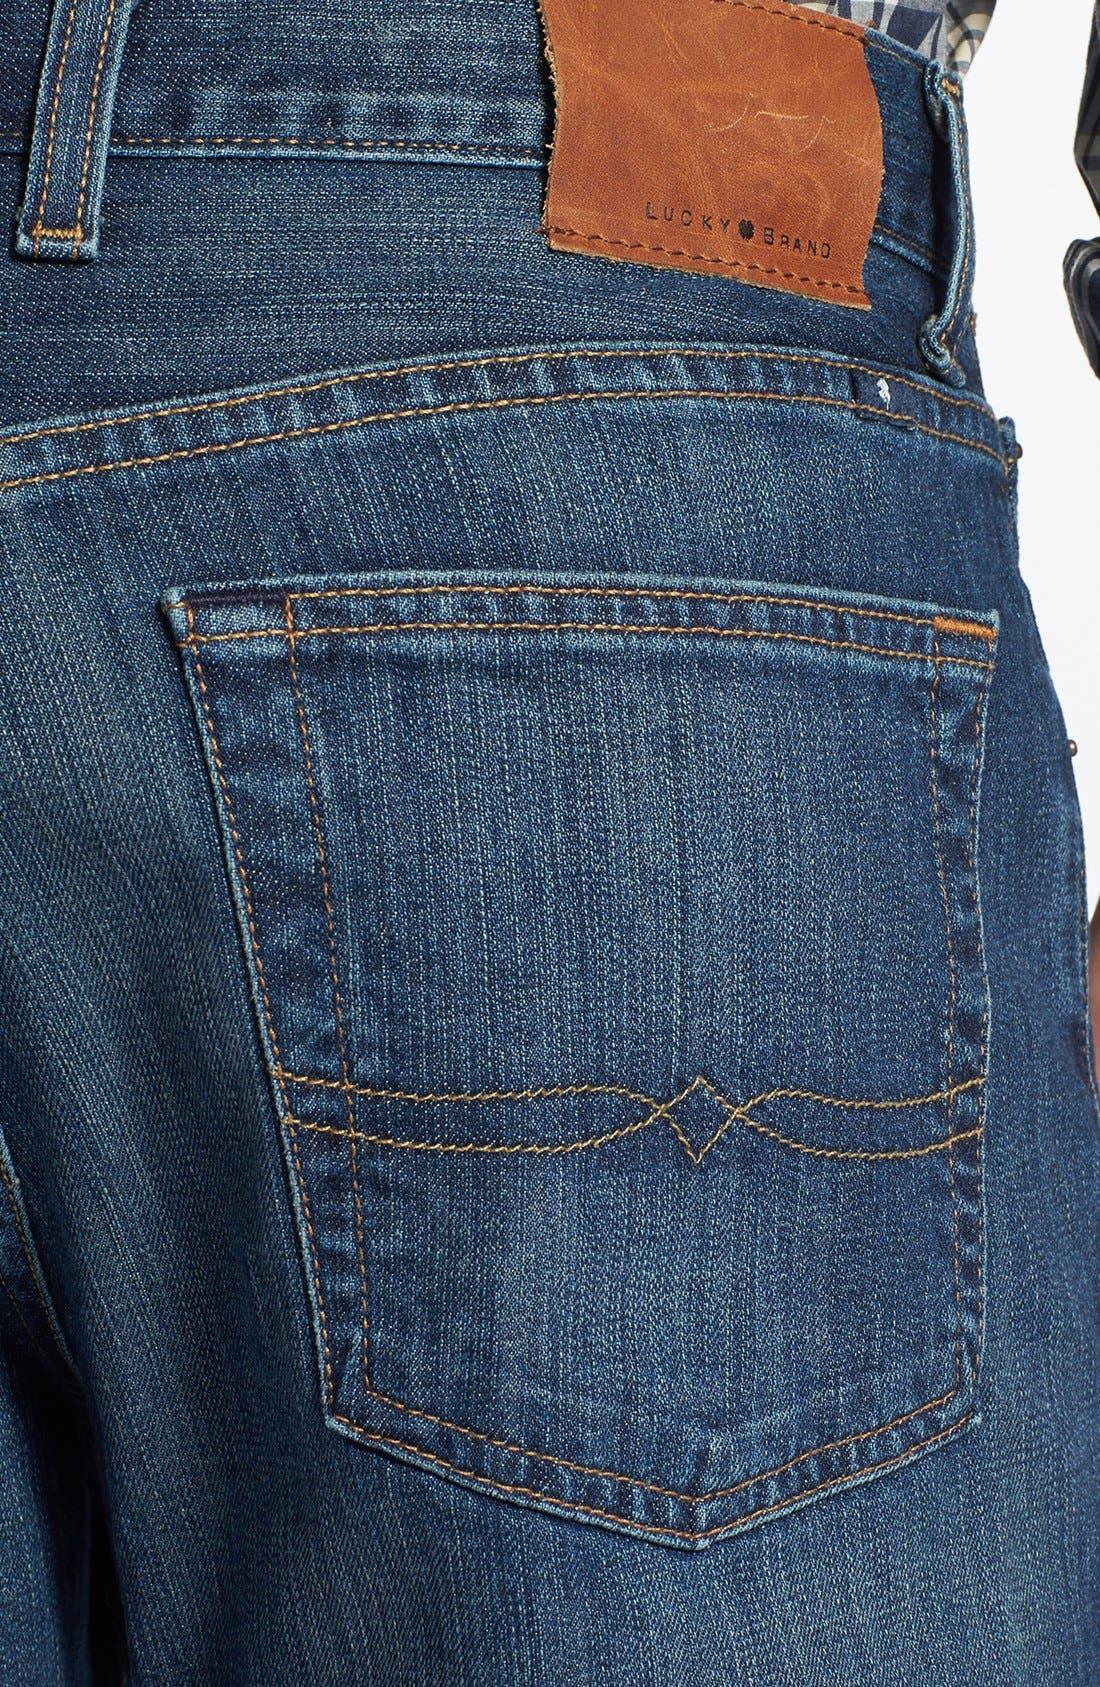 Alternate Image 4  - Lucky Brand '481' Relaxed Fit Jeans (Mazatlan)